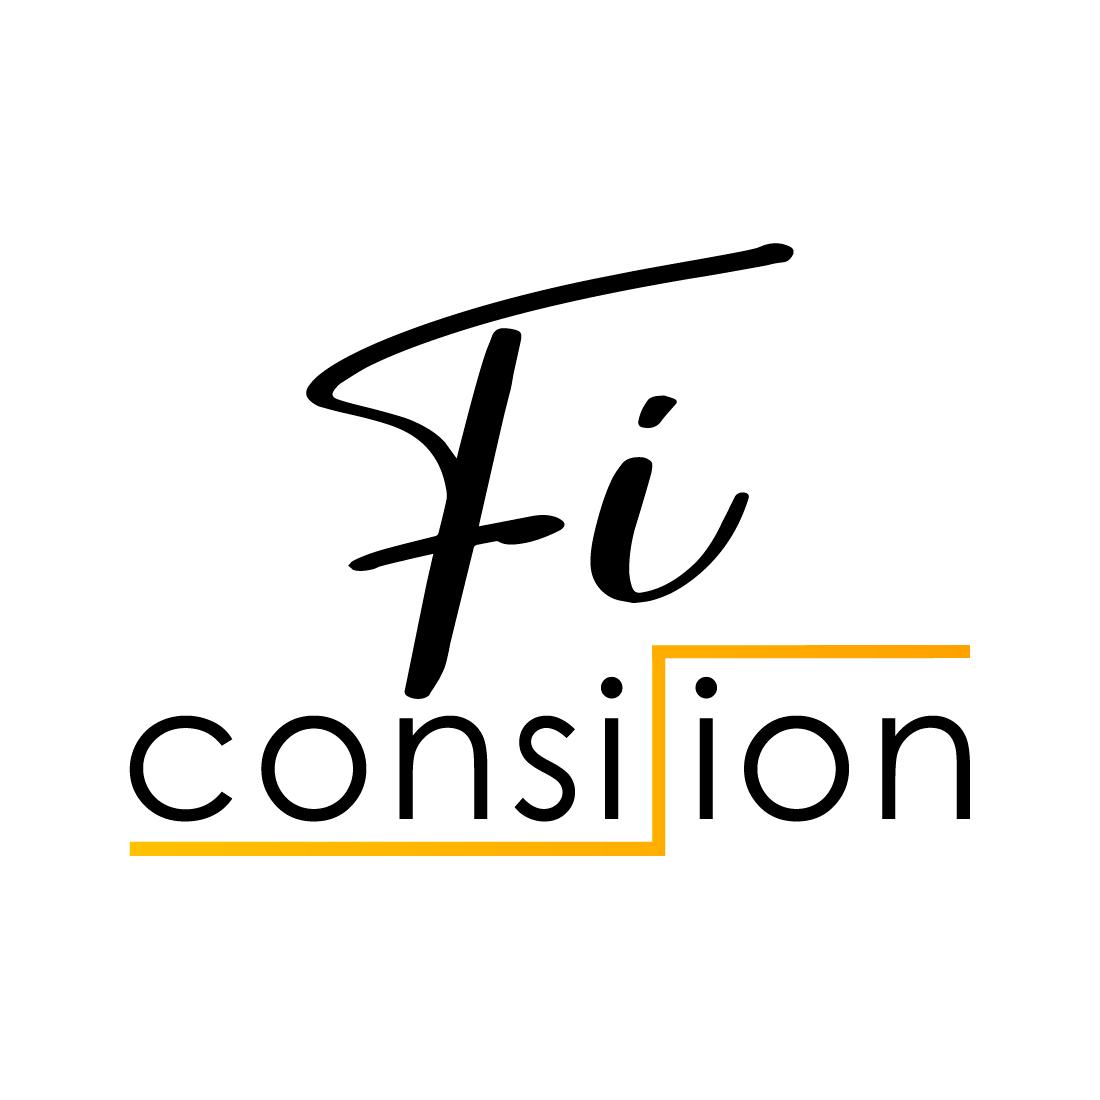 ficonsilion